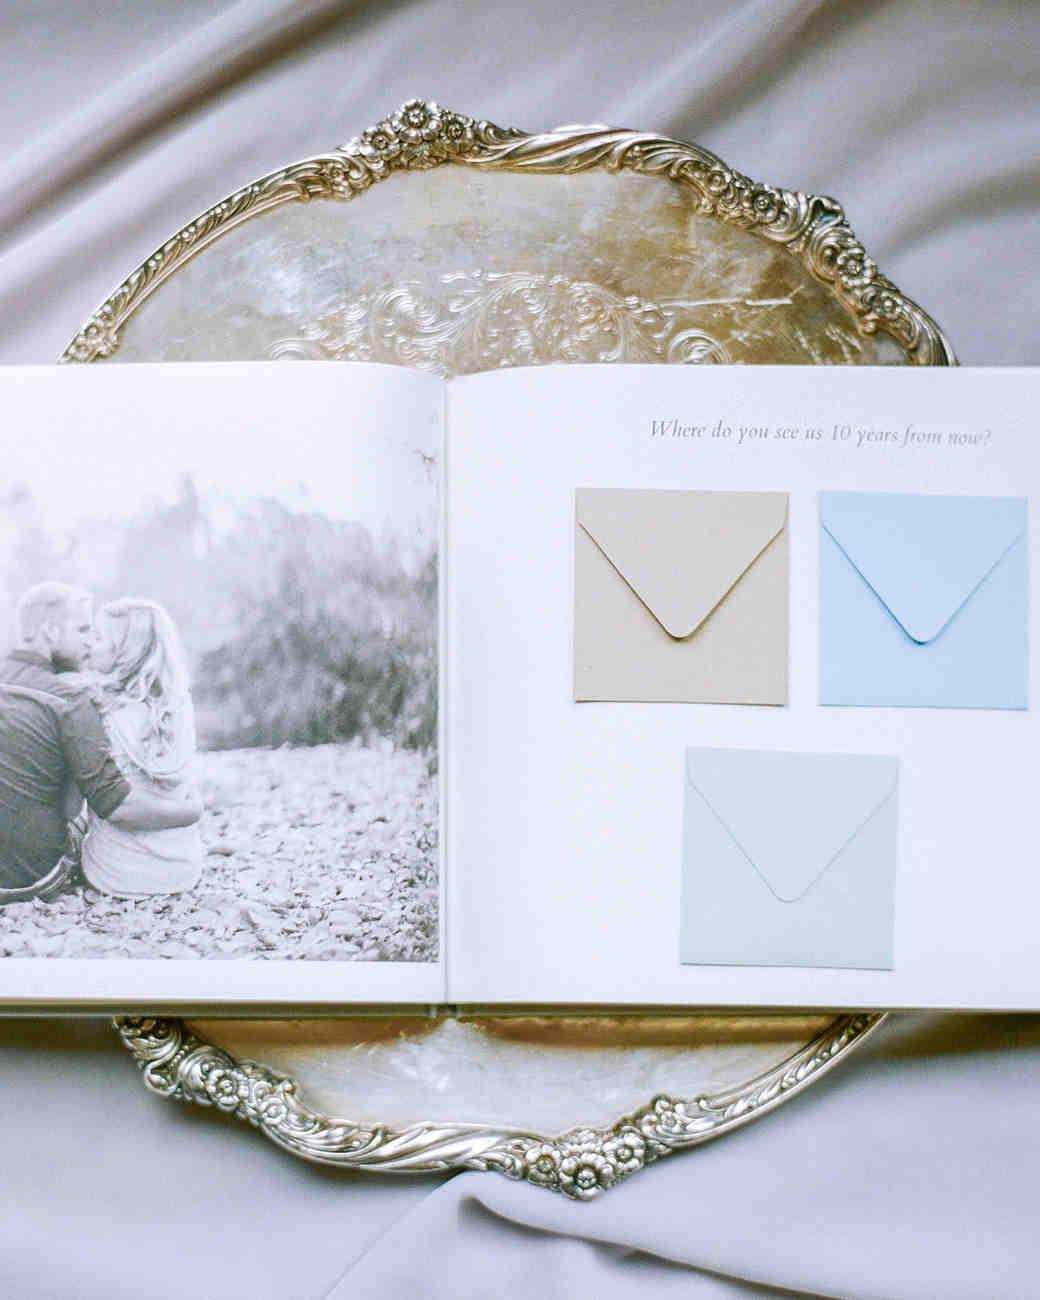 kendall-grant-wedding-guestbook-022-s112328-1215.jpg